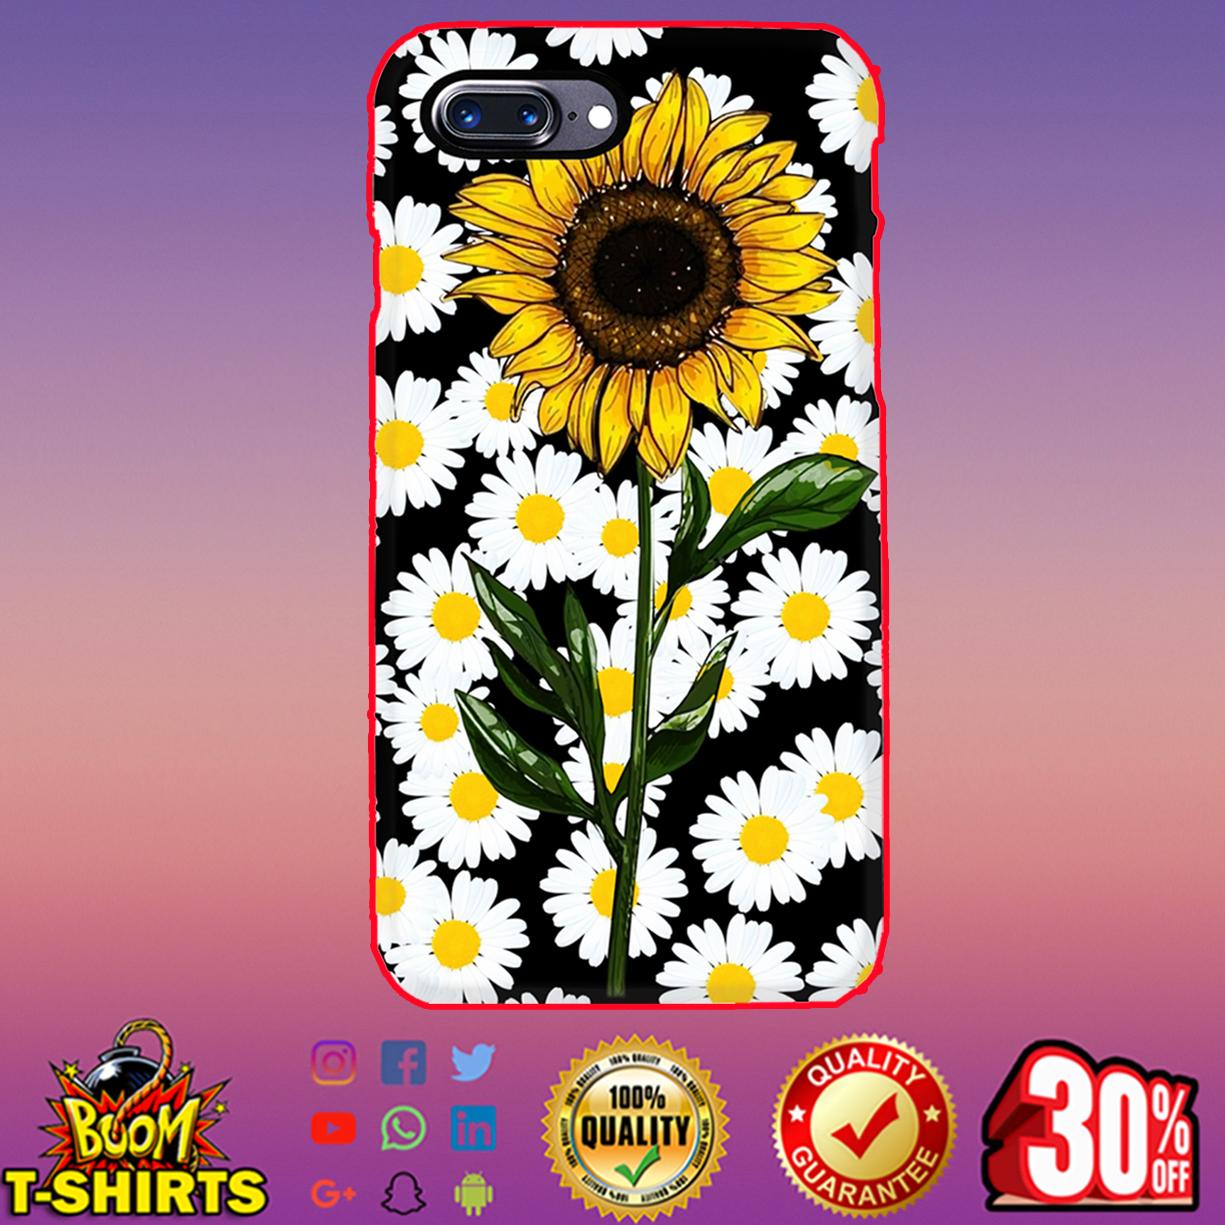 Sunflower daisy phone case - Ịphone 7 plus case